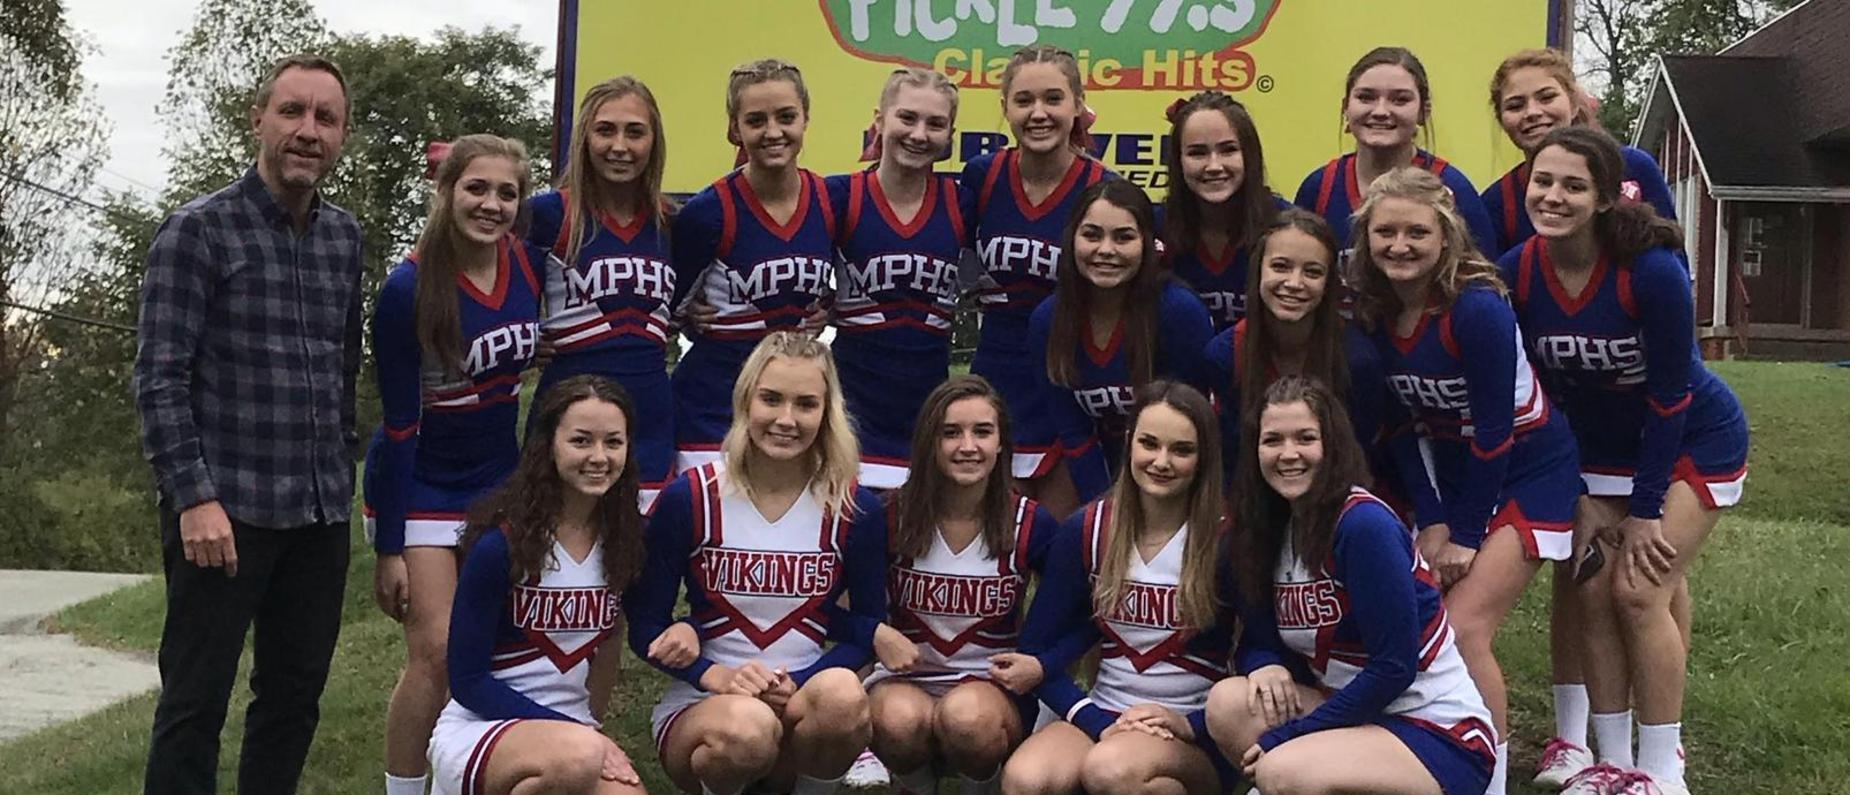 Cheerleaders with Froggy